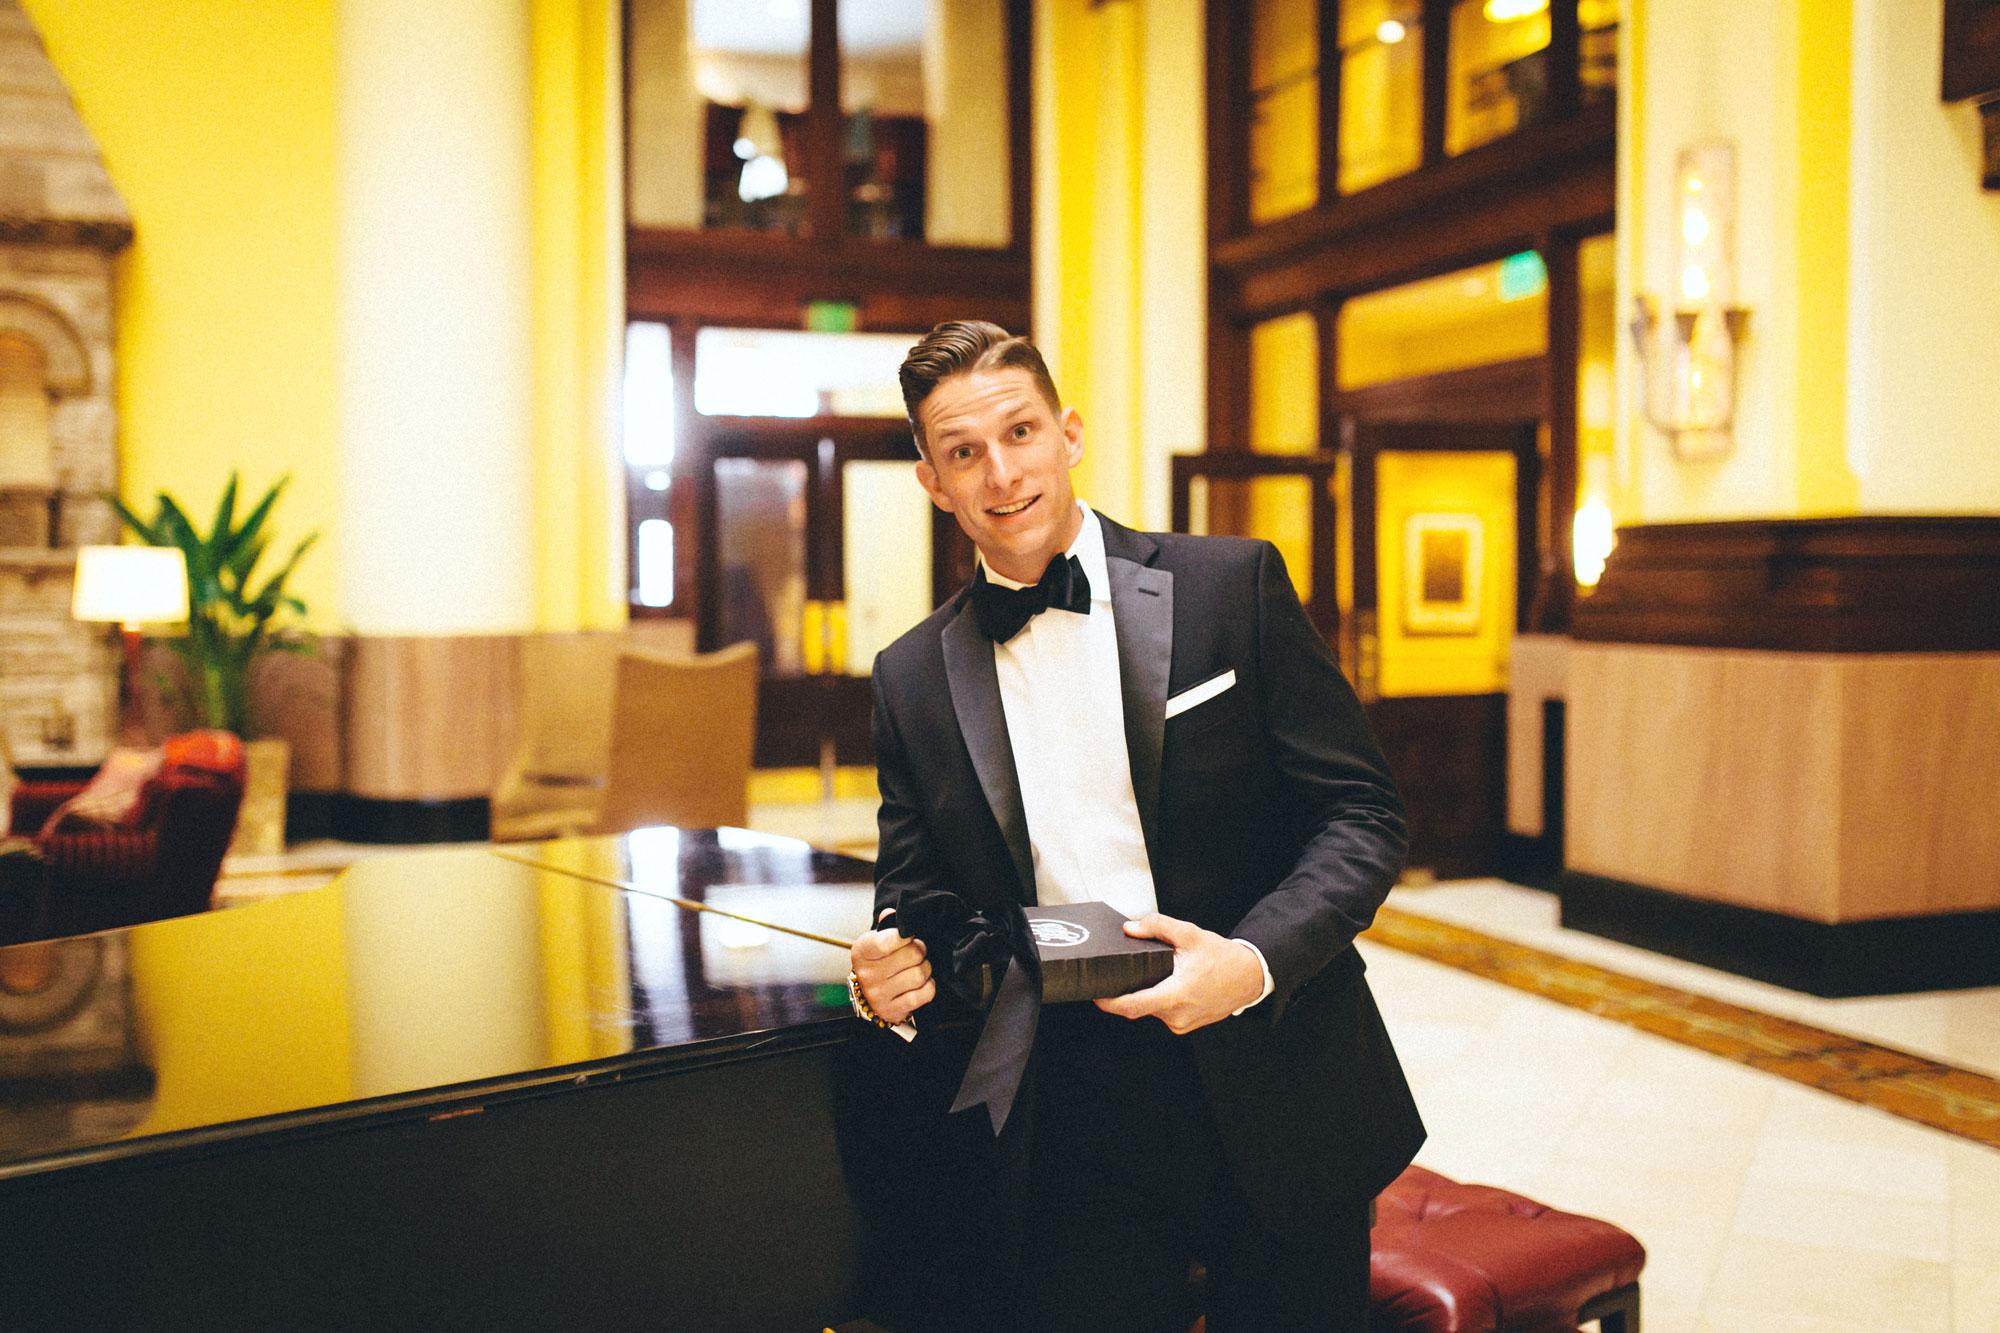 Me & Mr. Jones Wedding, Black Tie Wedding, Calvin Klein Black Slim Fit Tuxedo, Monogram Dress Shirt, Classic Groom